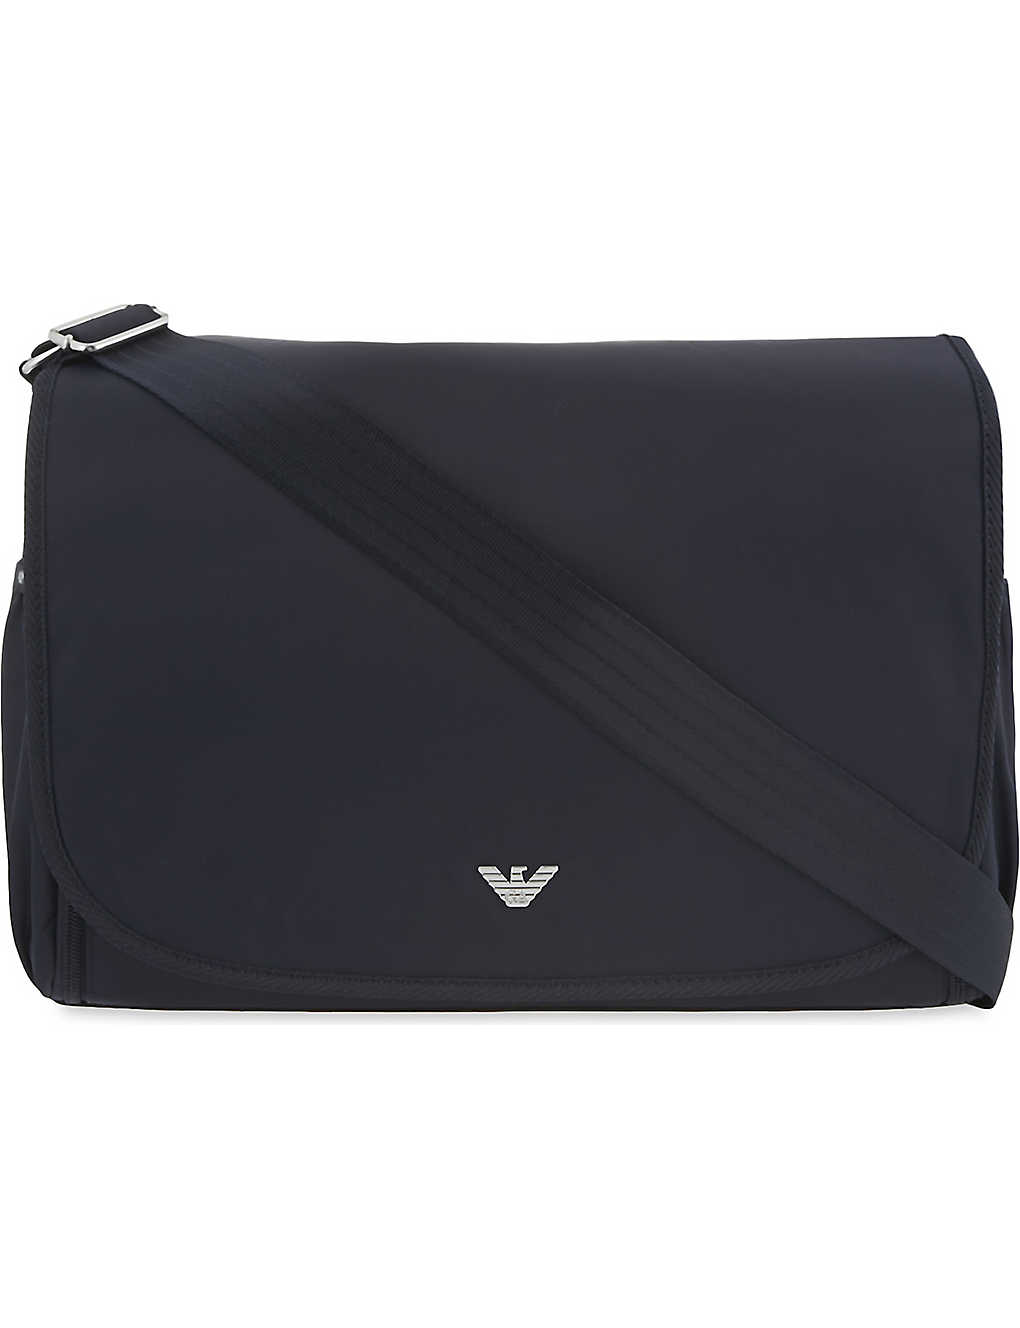 ca25c21d803c EMPORIO ARMANI - Changing bag | Selfridges.com